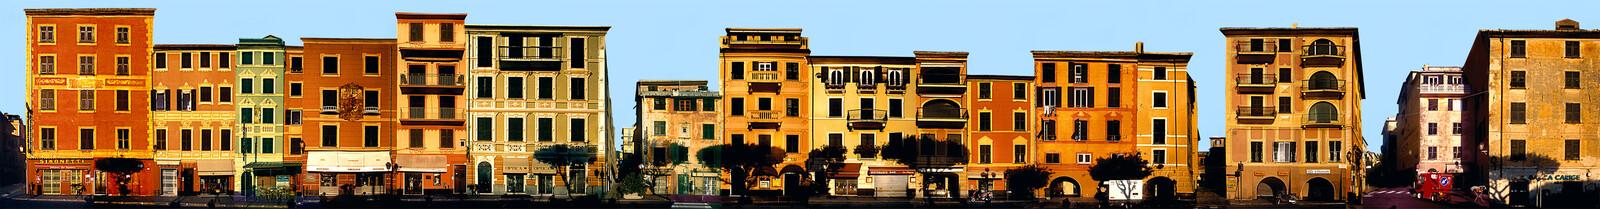 Santa Margherita #2, Venice, Italy - Larry Yust